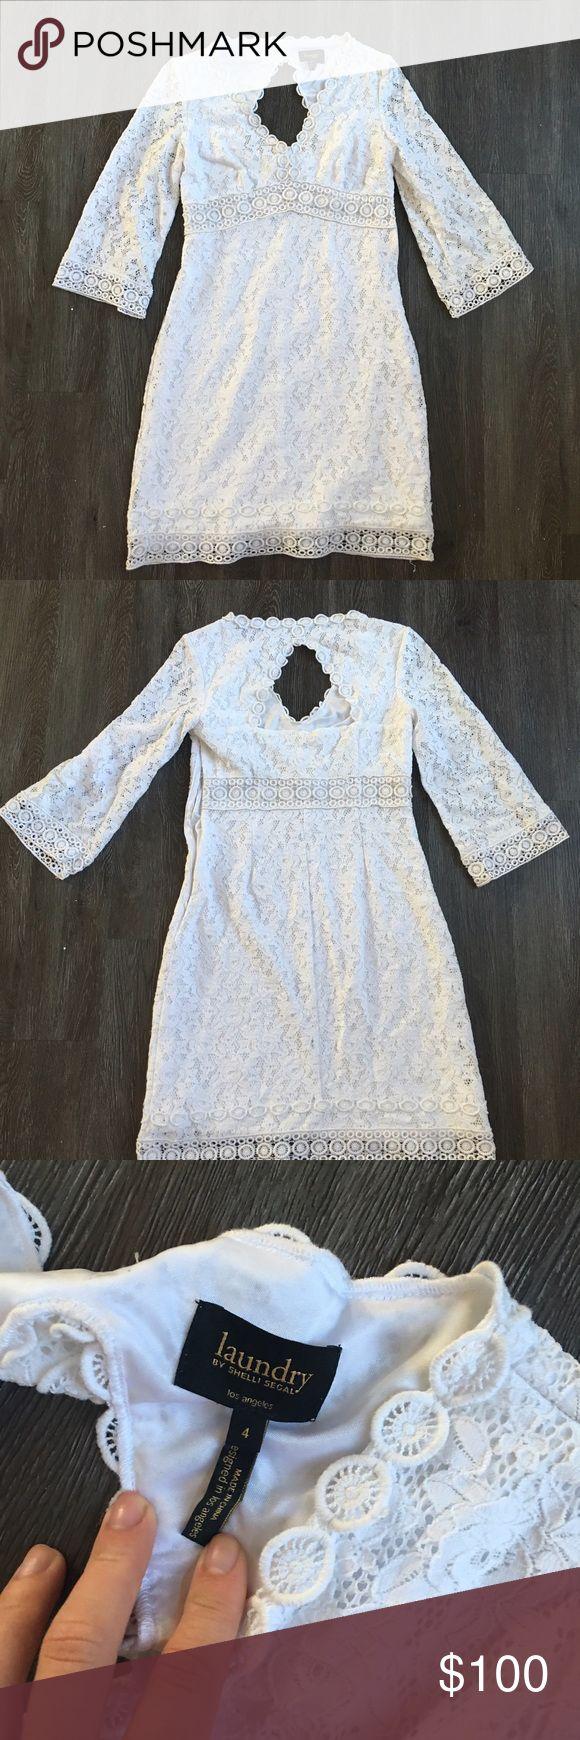 Laundry by Shelli Segal White Lace Dress Laundry by Shelli Segal White Lace Dress. Size 4. Worn once. Laundry by Shelli Segal Dresses Long Sleeve